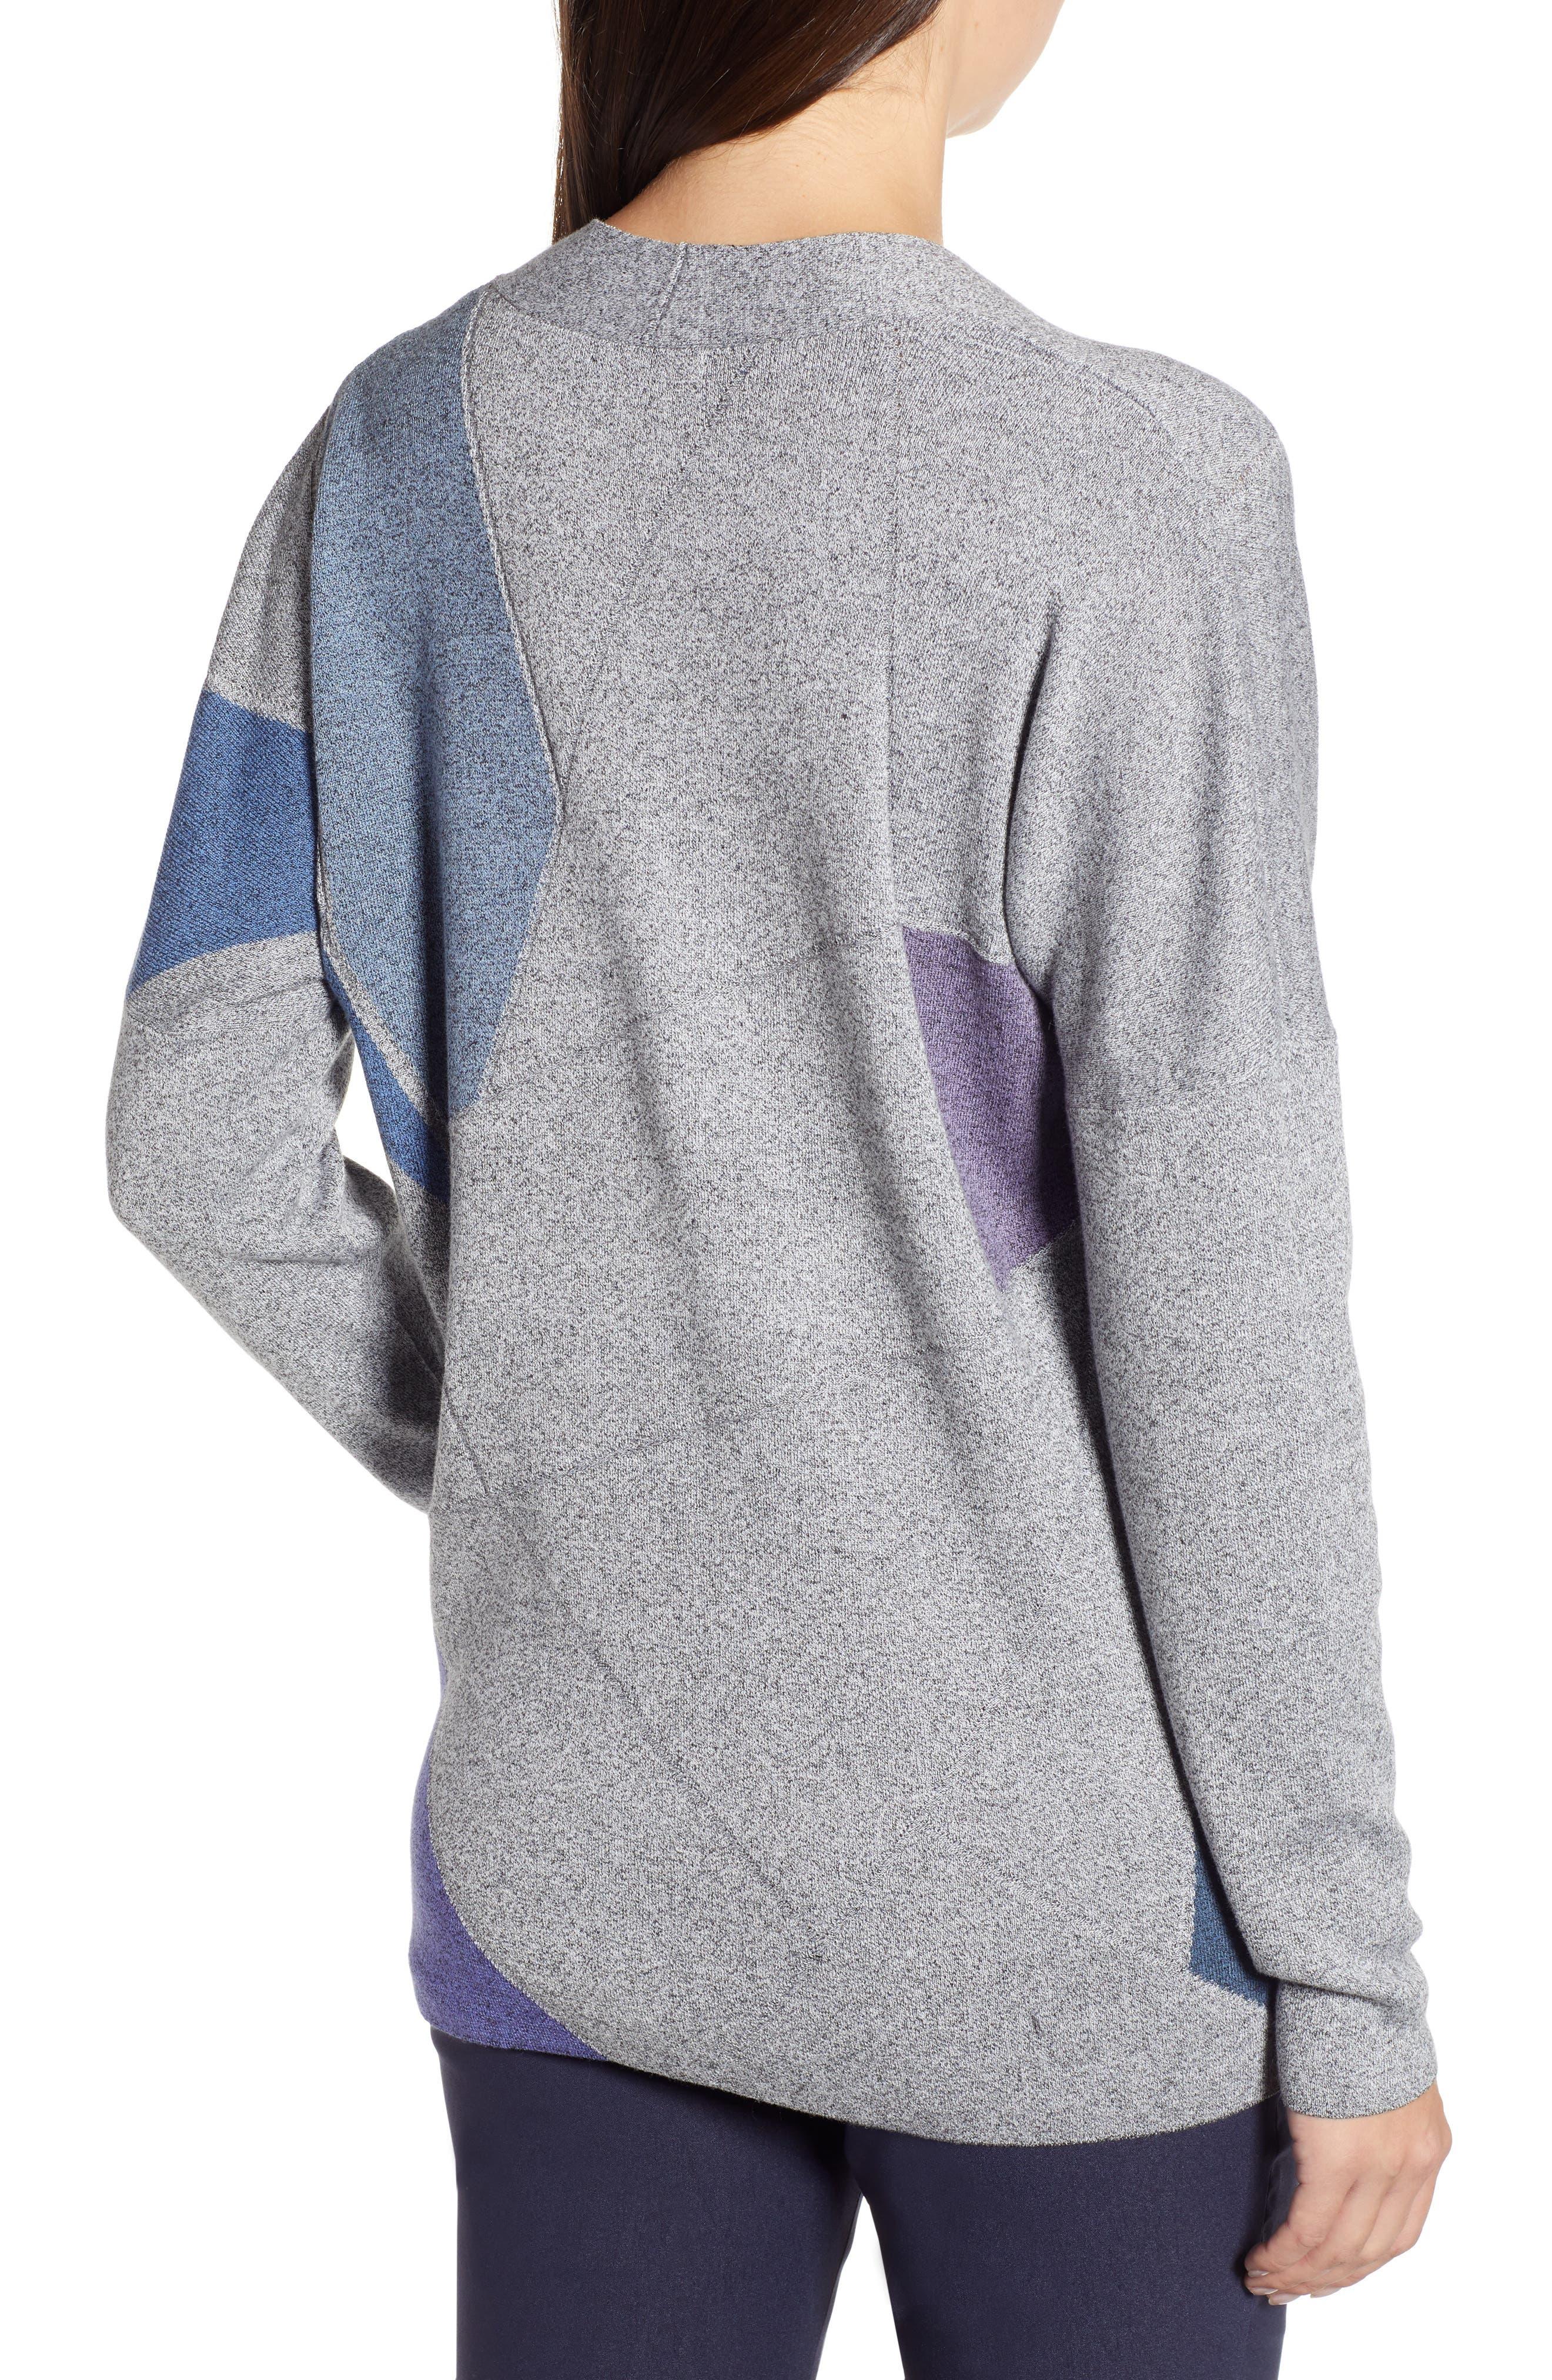 Colorblock Sweater,                             Alternate thumbnail 2, color,                             MULTI